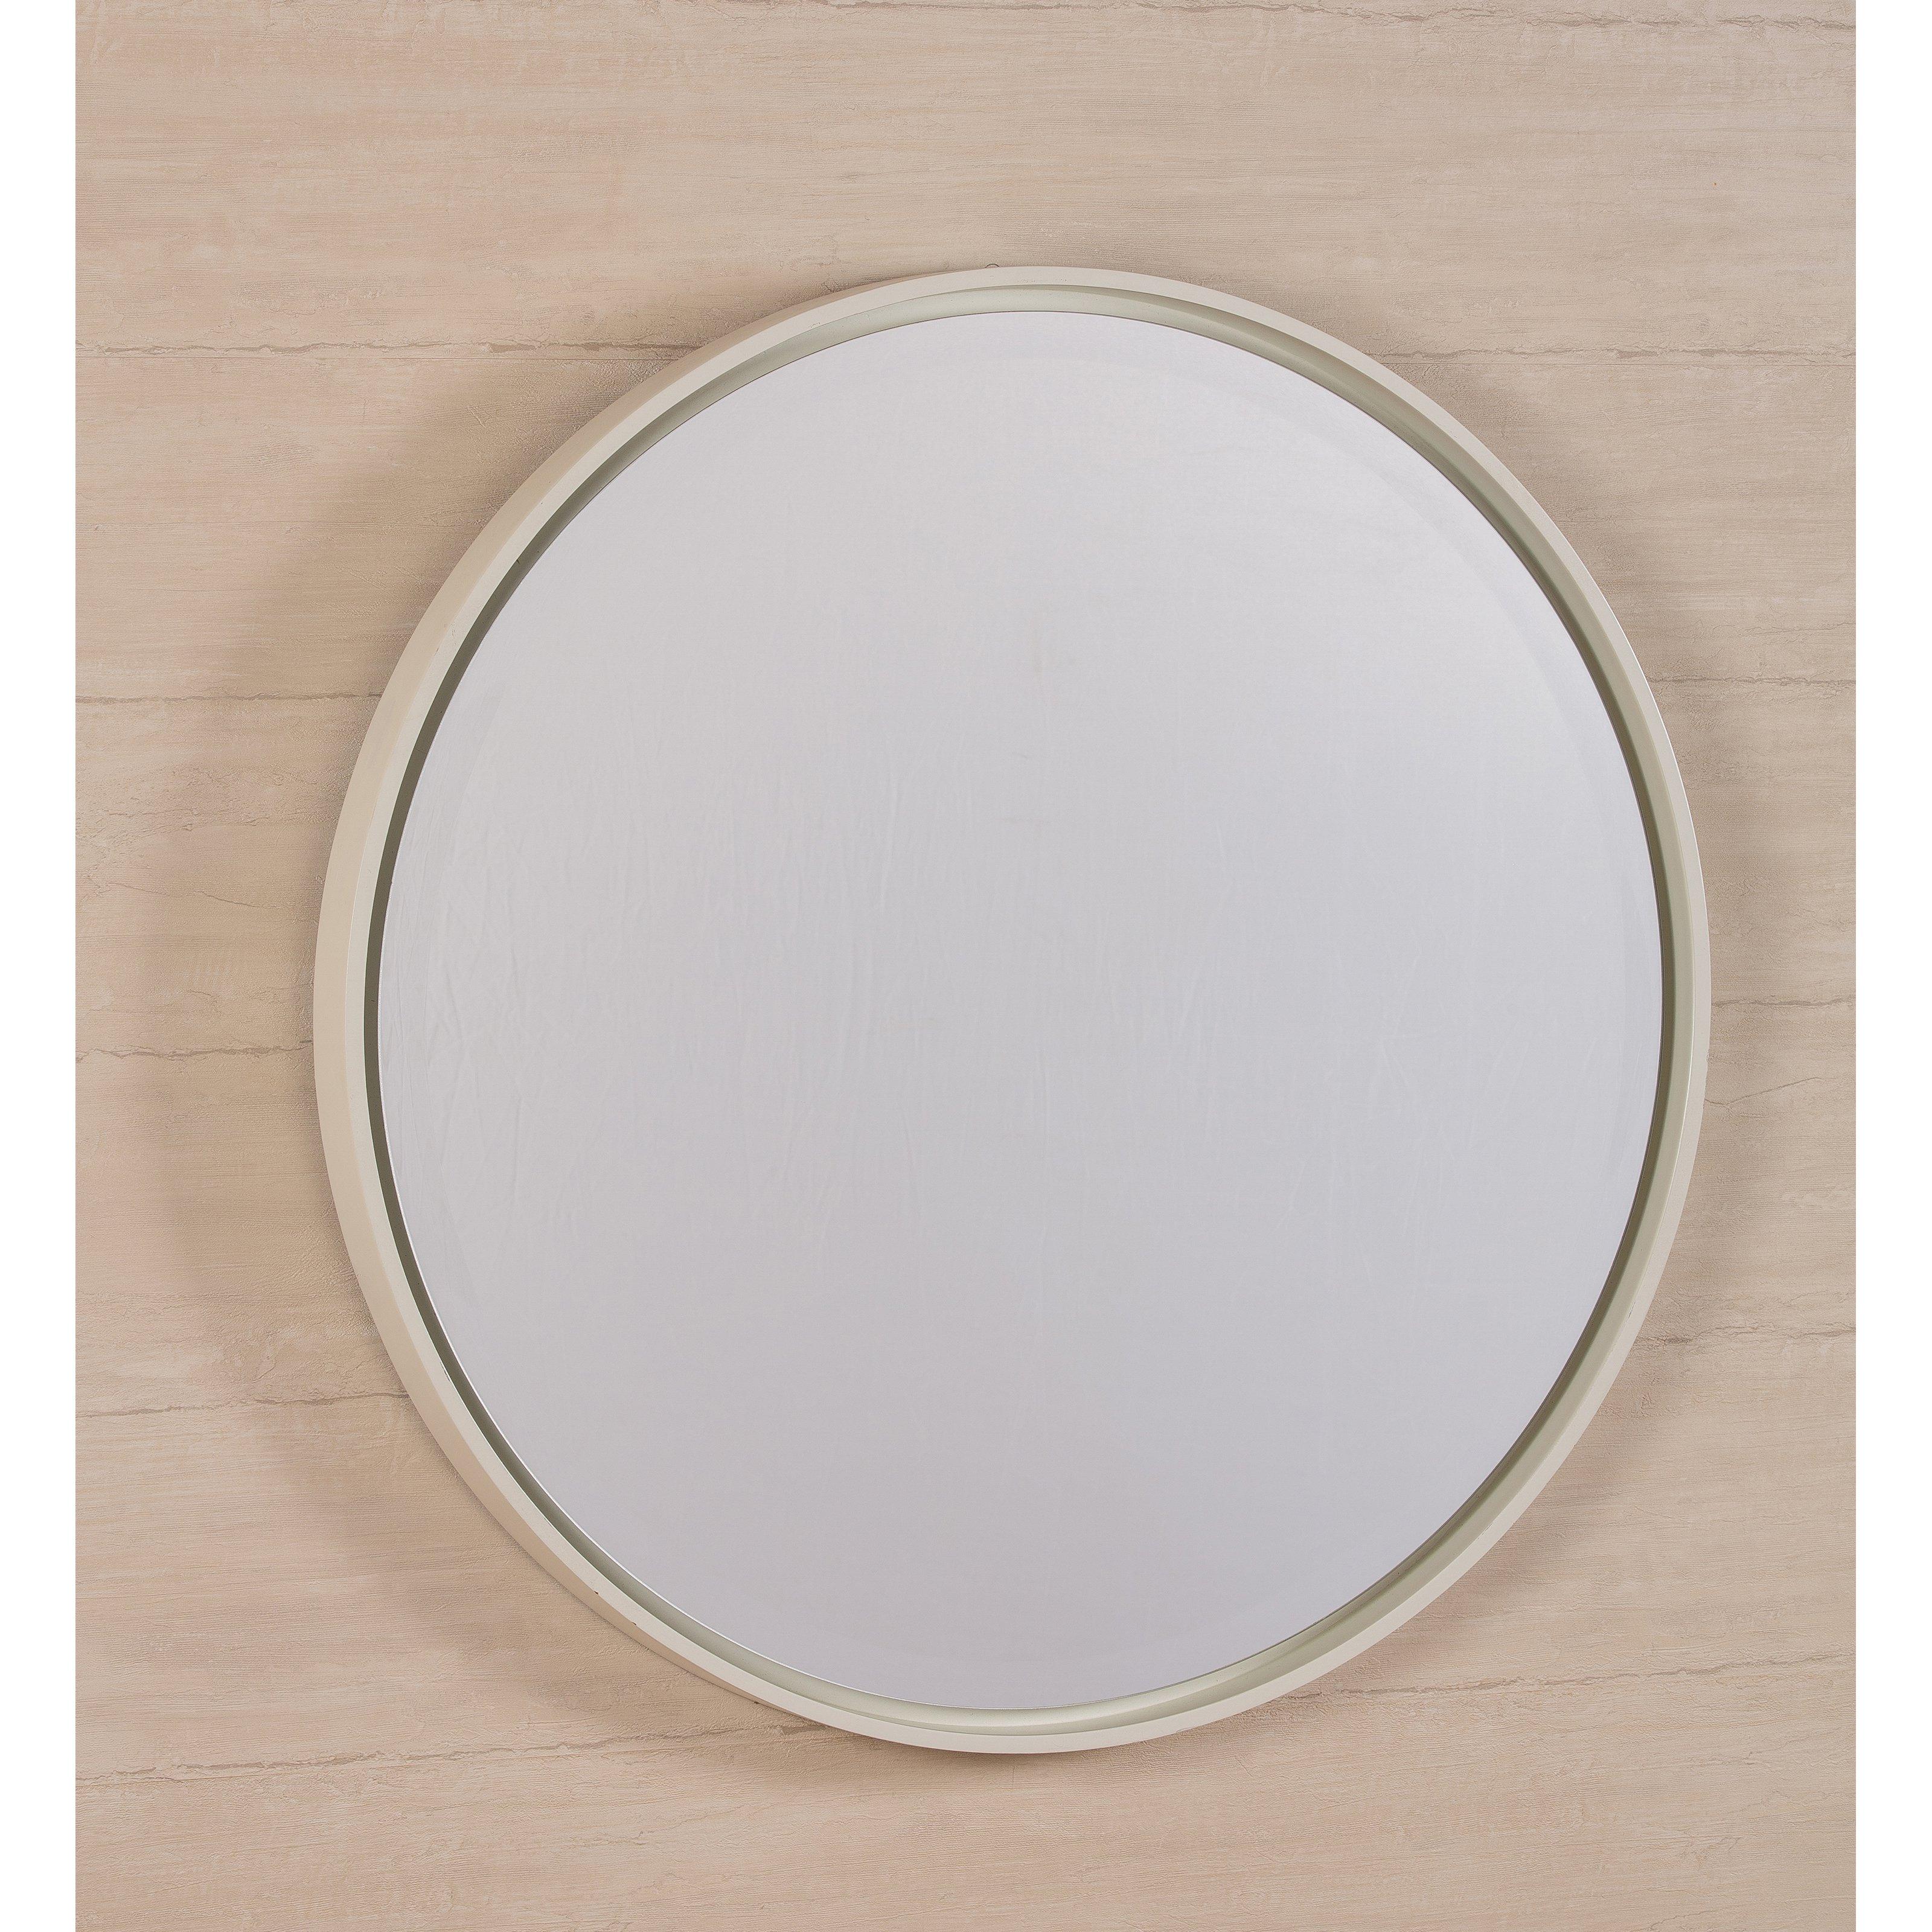 Cooper Classics Hadly Wall Mirror by Cooper Classics